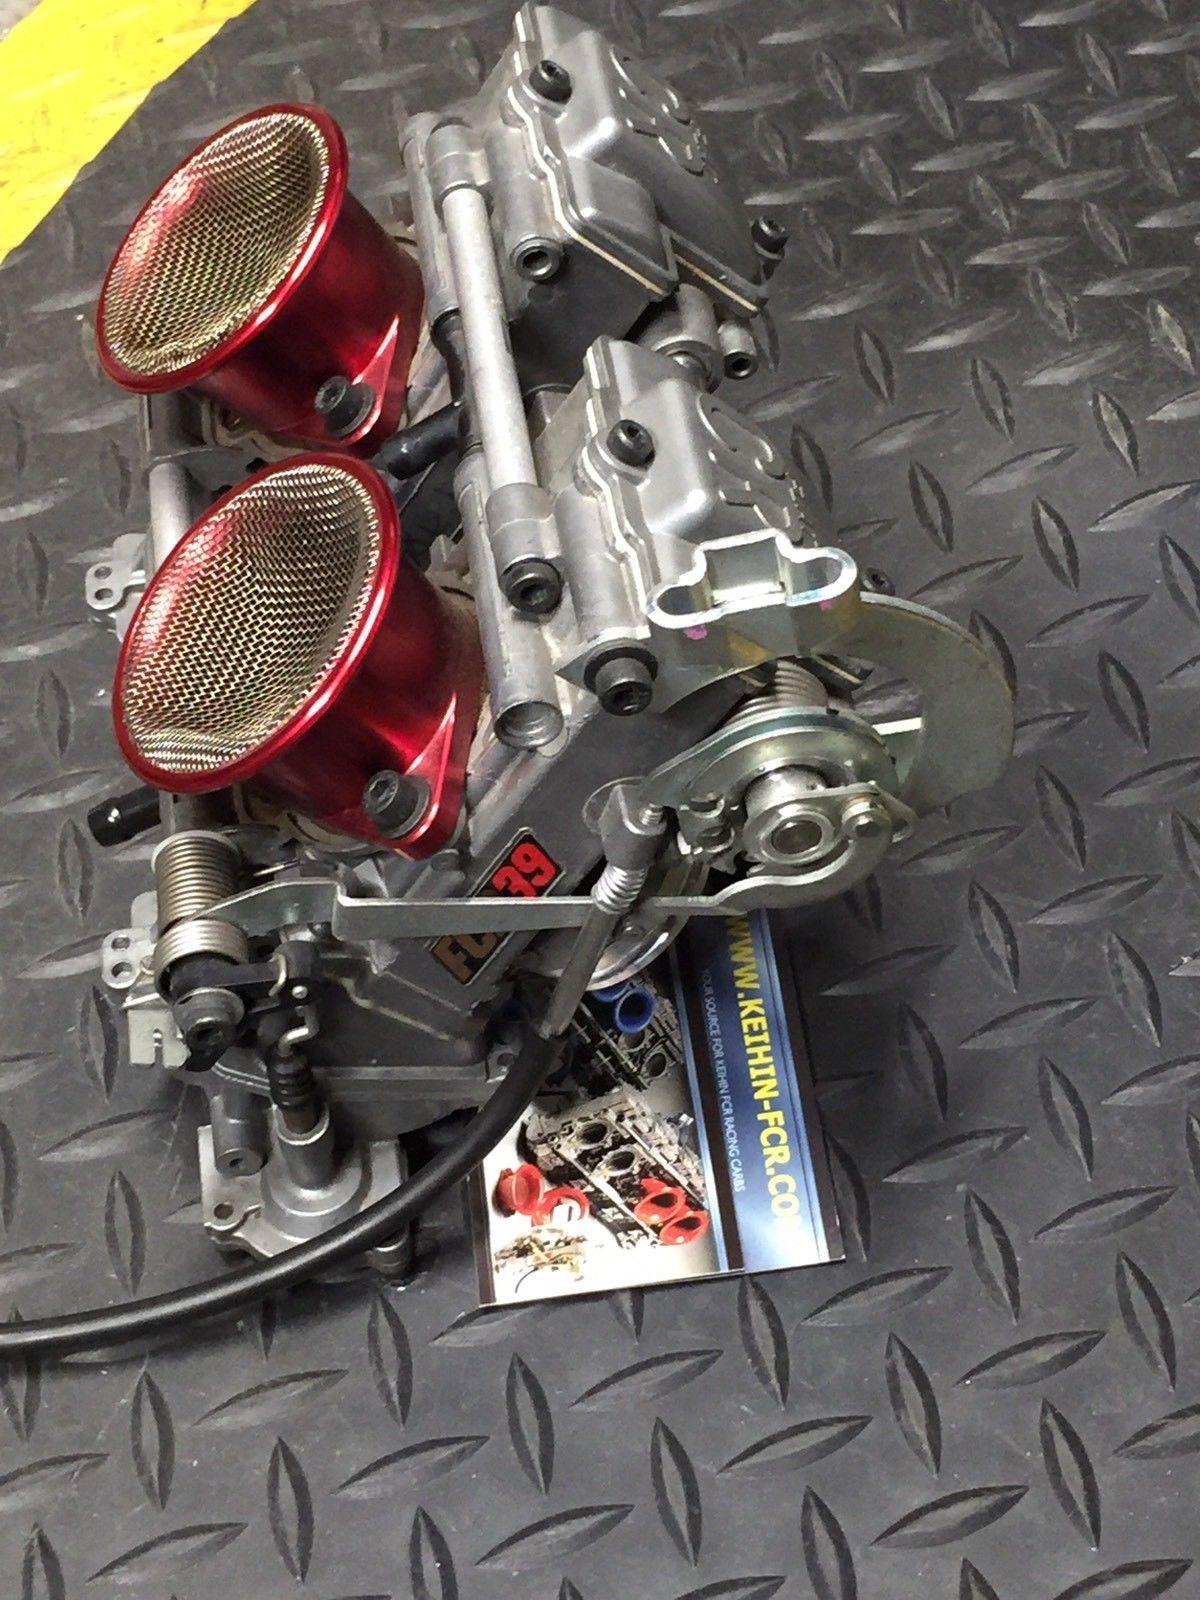 WWW KEIHIN-FCR COM : Ducati 900 MONSTER / Keihin Fcr 39